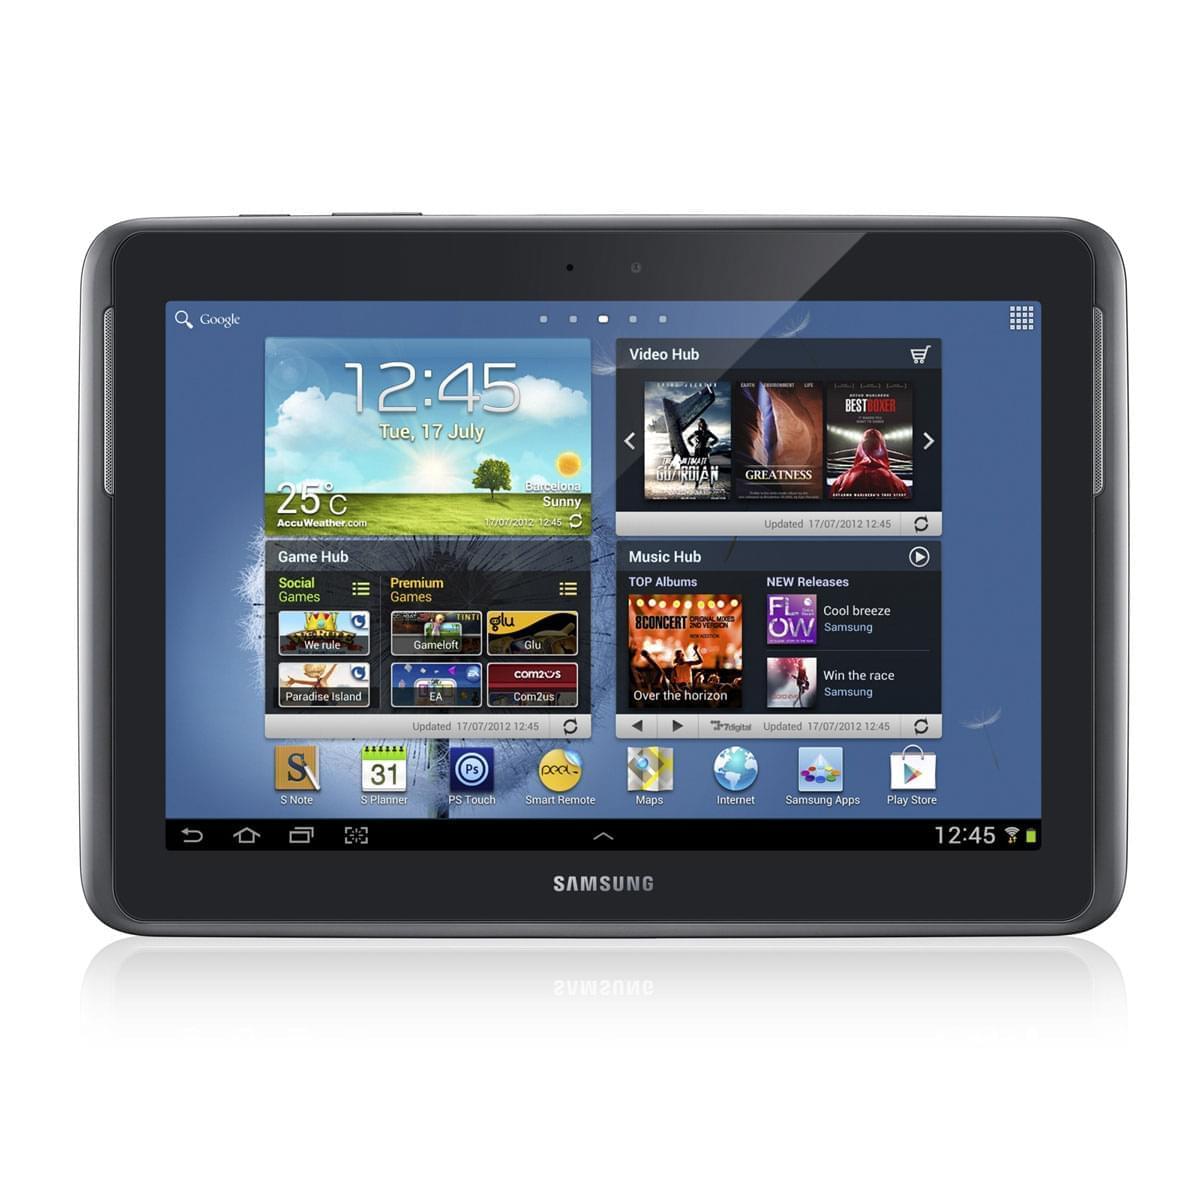 "Samsung Galaxy Note 10.1 N8000EAE-Argent/32Go/3G/10.1""/ICS (GT-N8000EAEXEF) - Achat / Vente Tablette Tactile sur Cybertek.fr - 0"